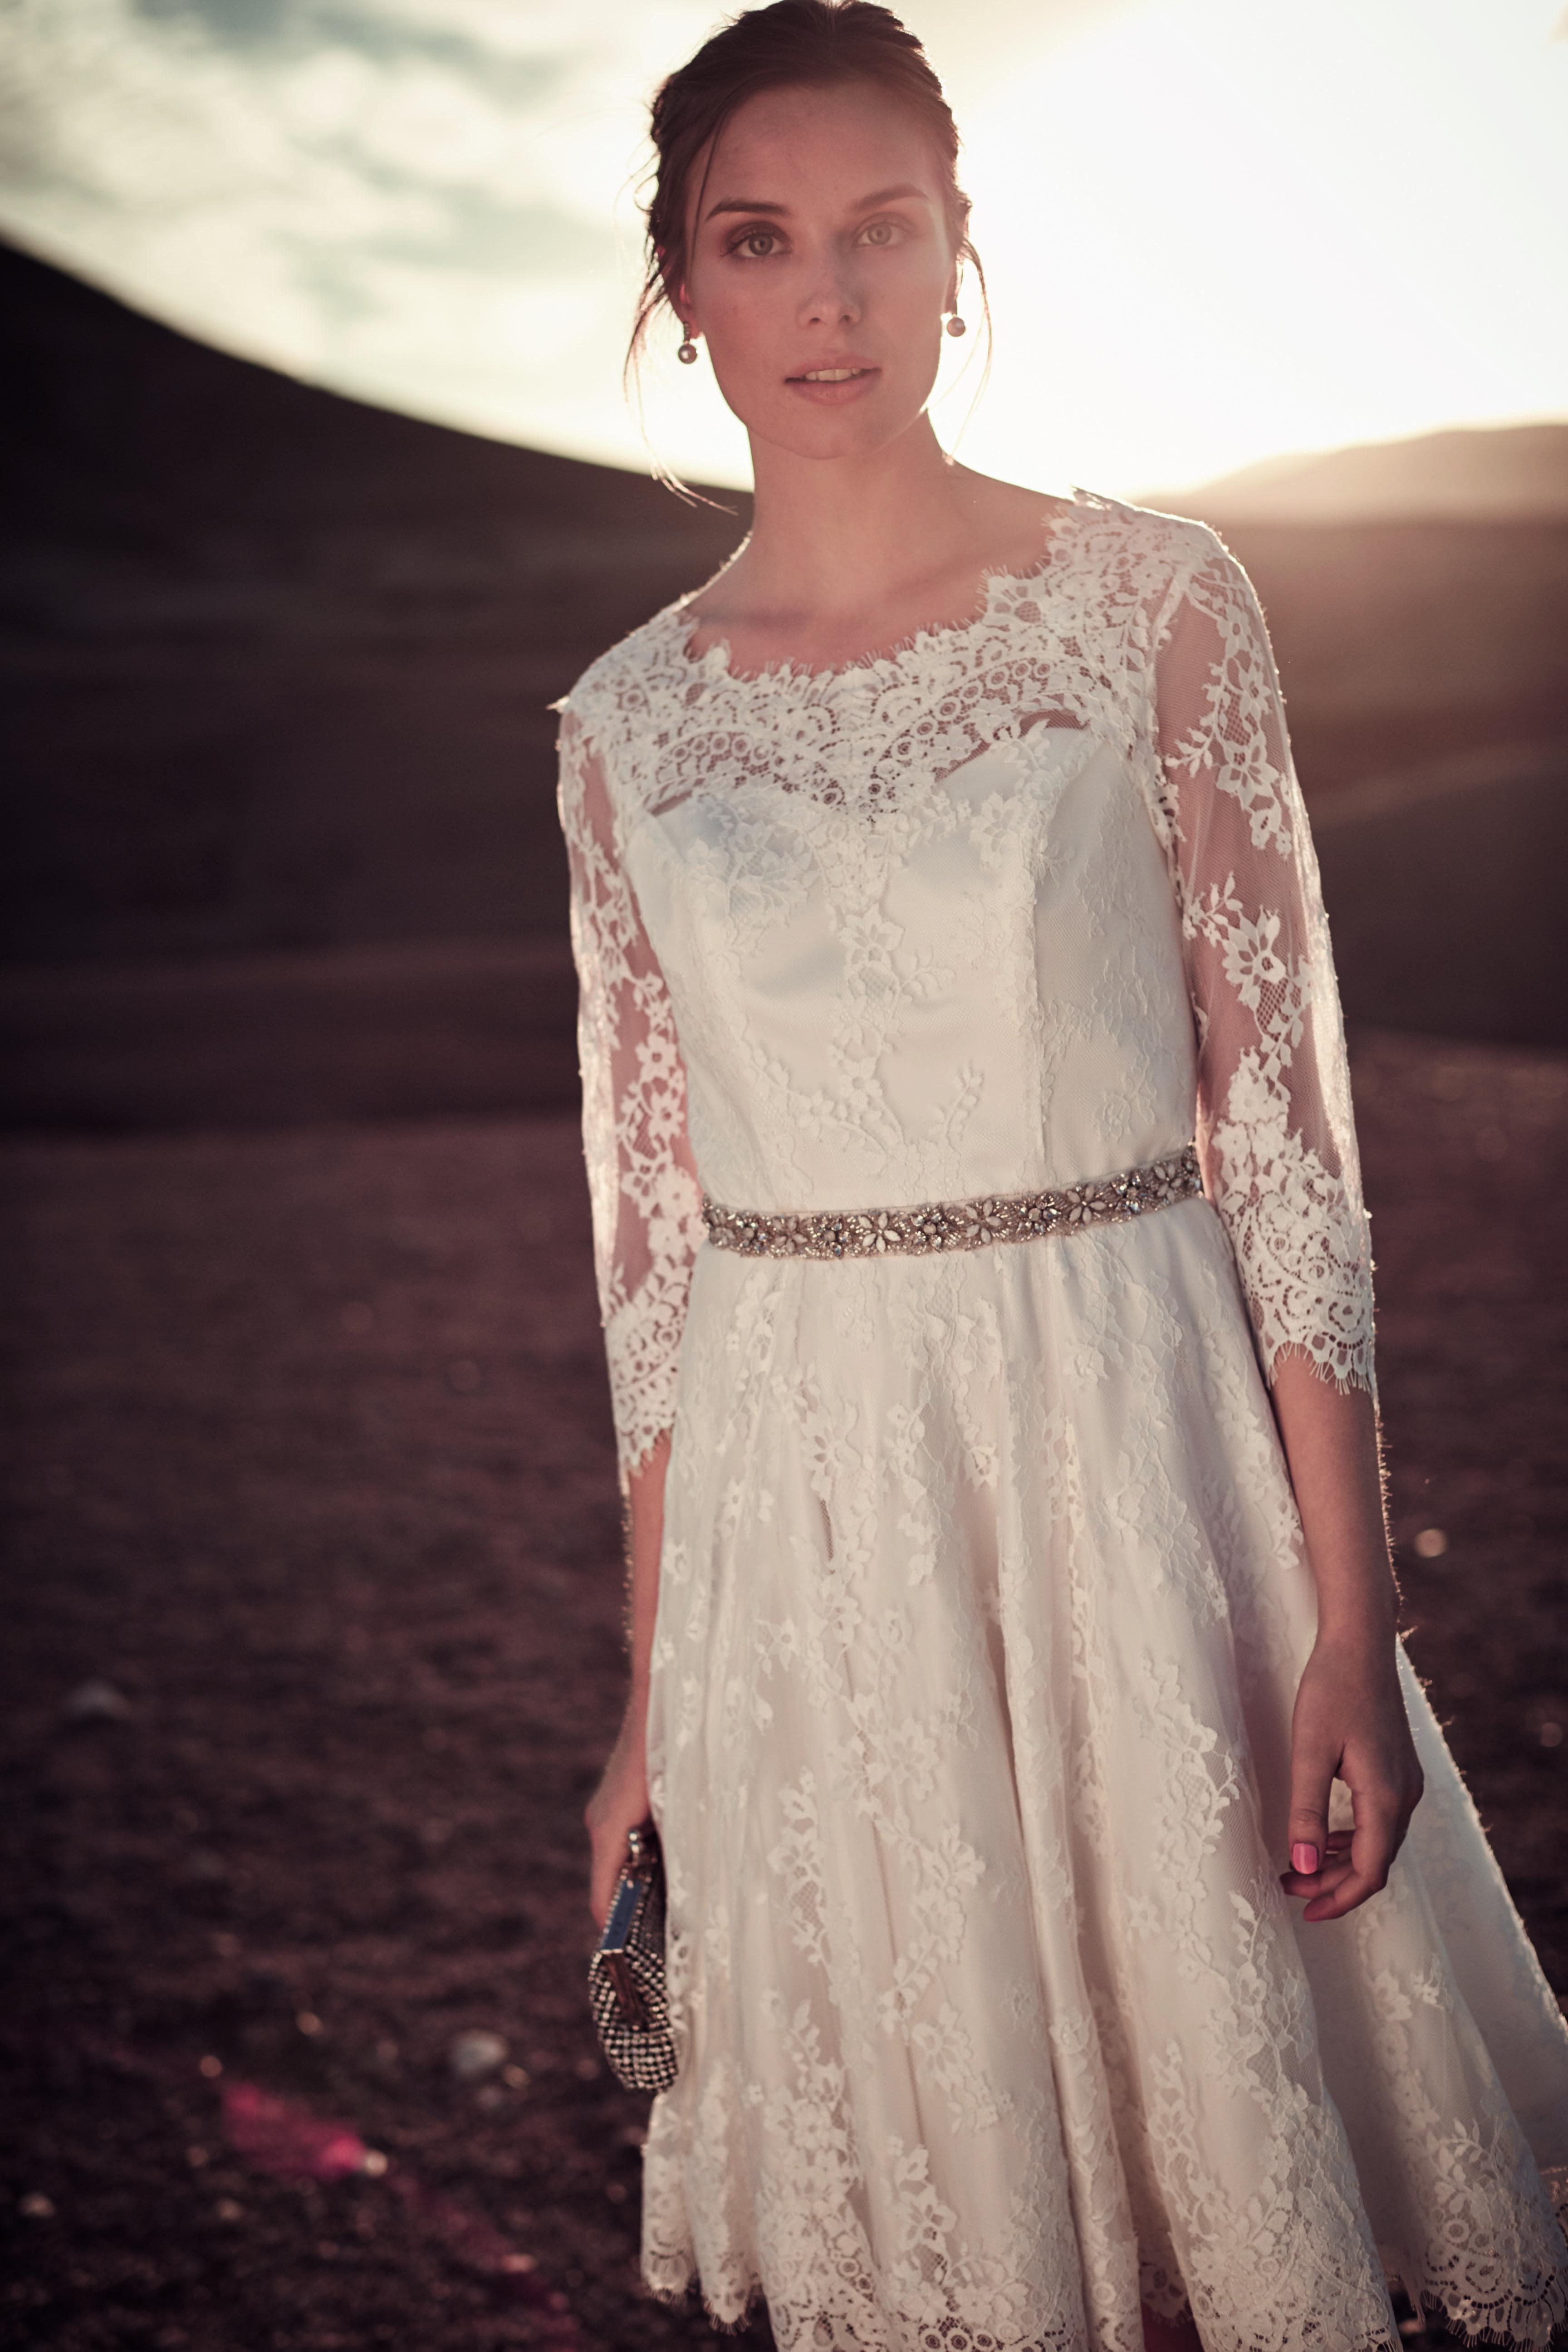 Cressida Wedding Dress. This vintage inspired lace prom wedding ...